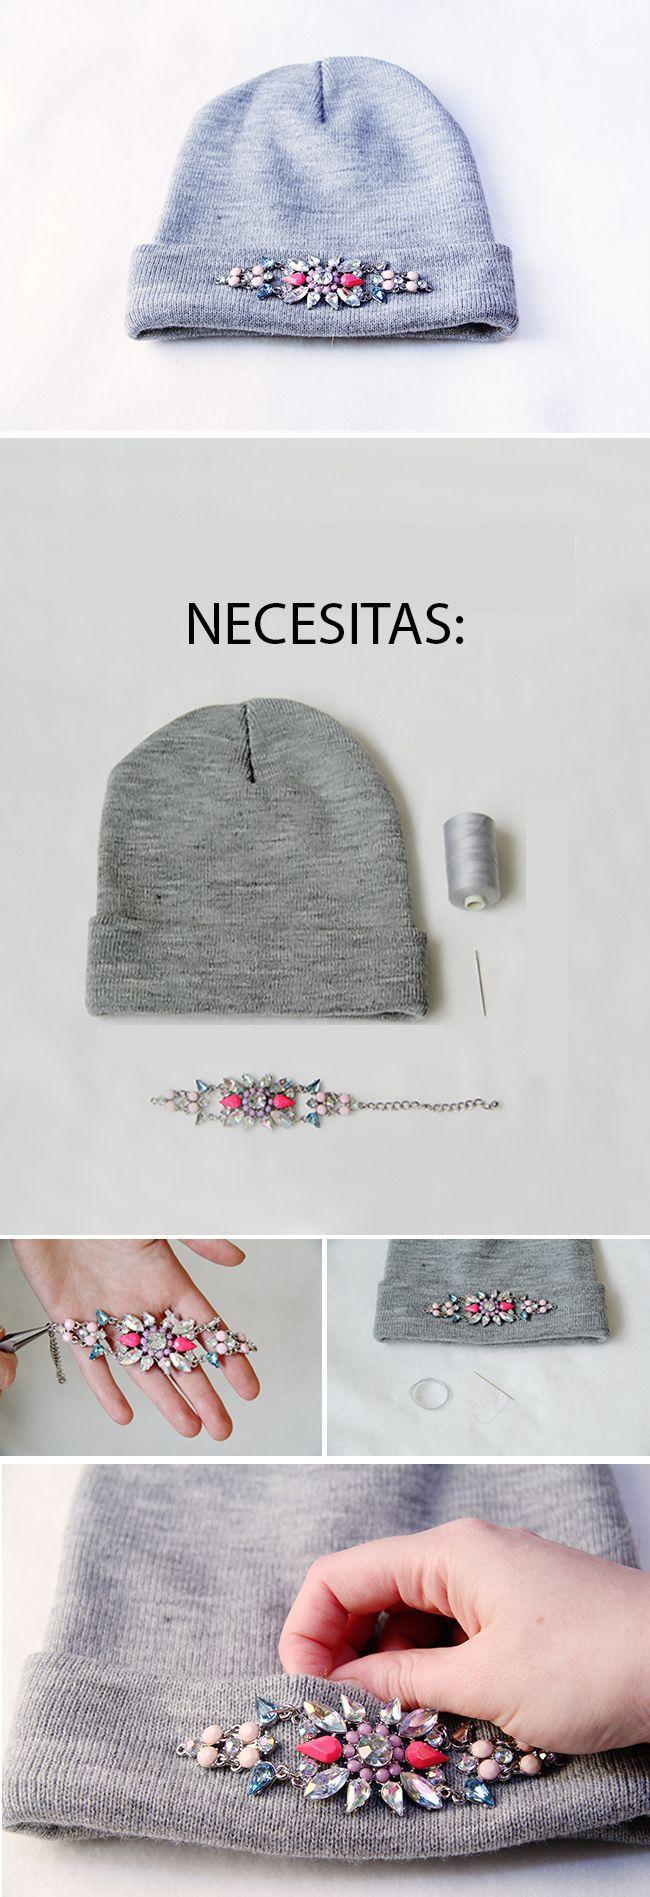 http://www.vistelacalle.com/134270/hazlo-tu-mismo-8-ideas-para-renovar-tu-ropa-de-invierno/